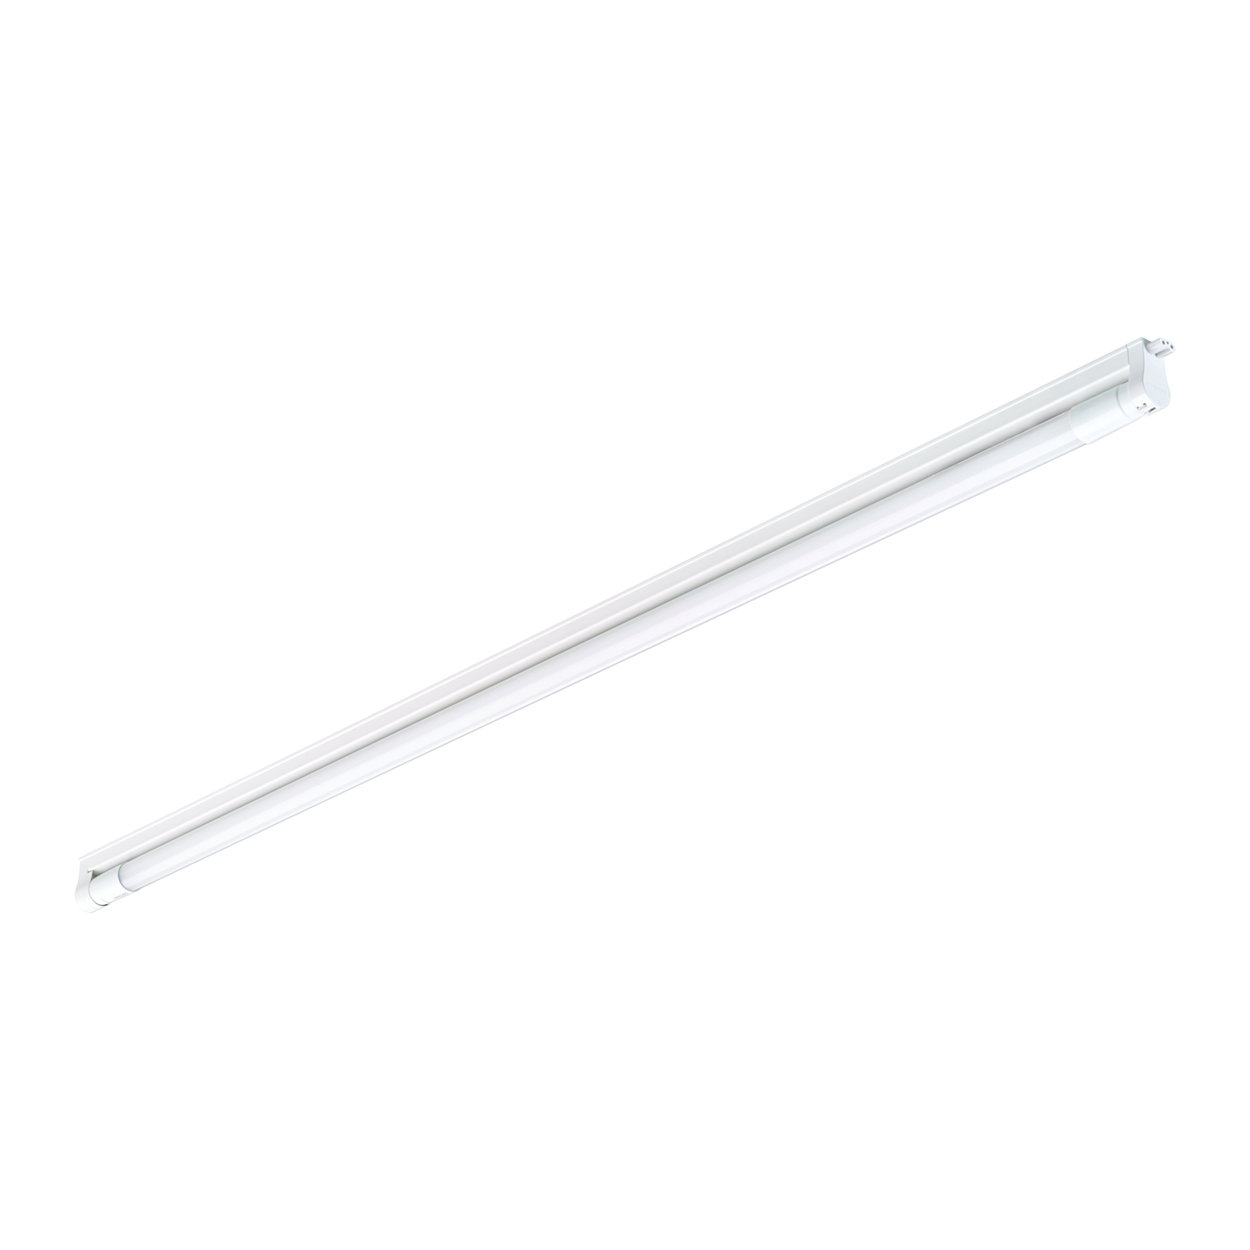 Ledinaire Batten − Simply great LED